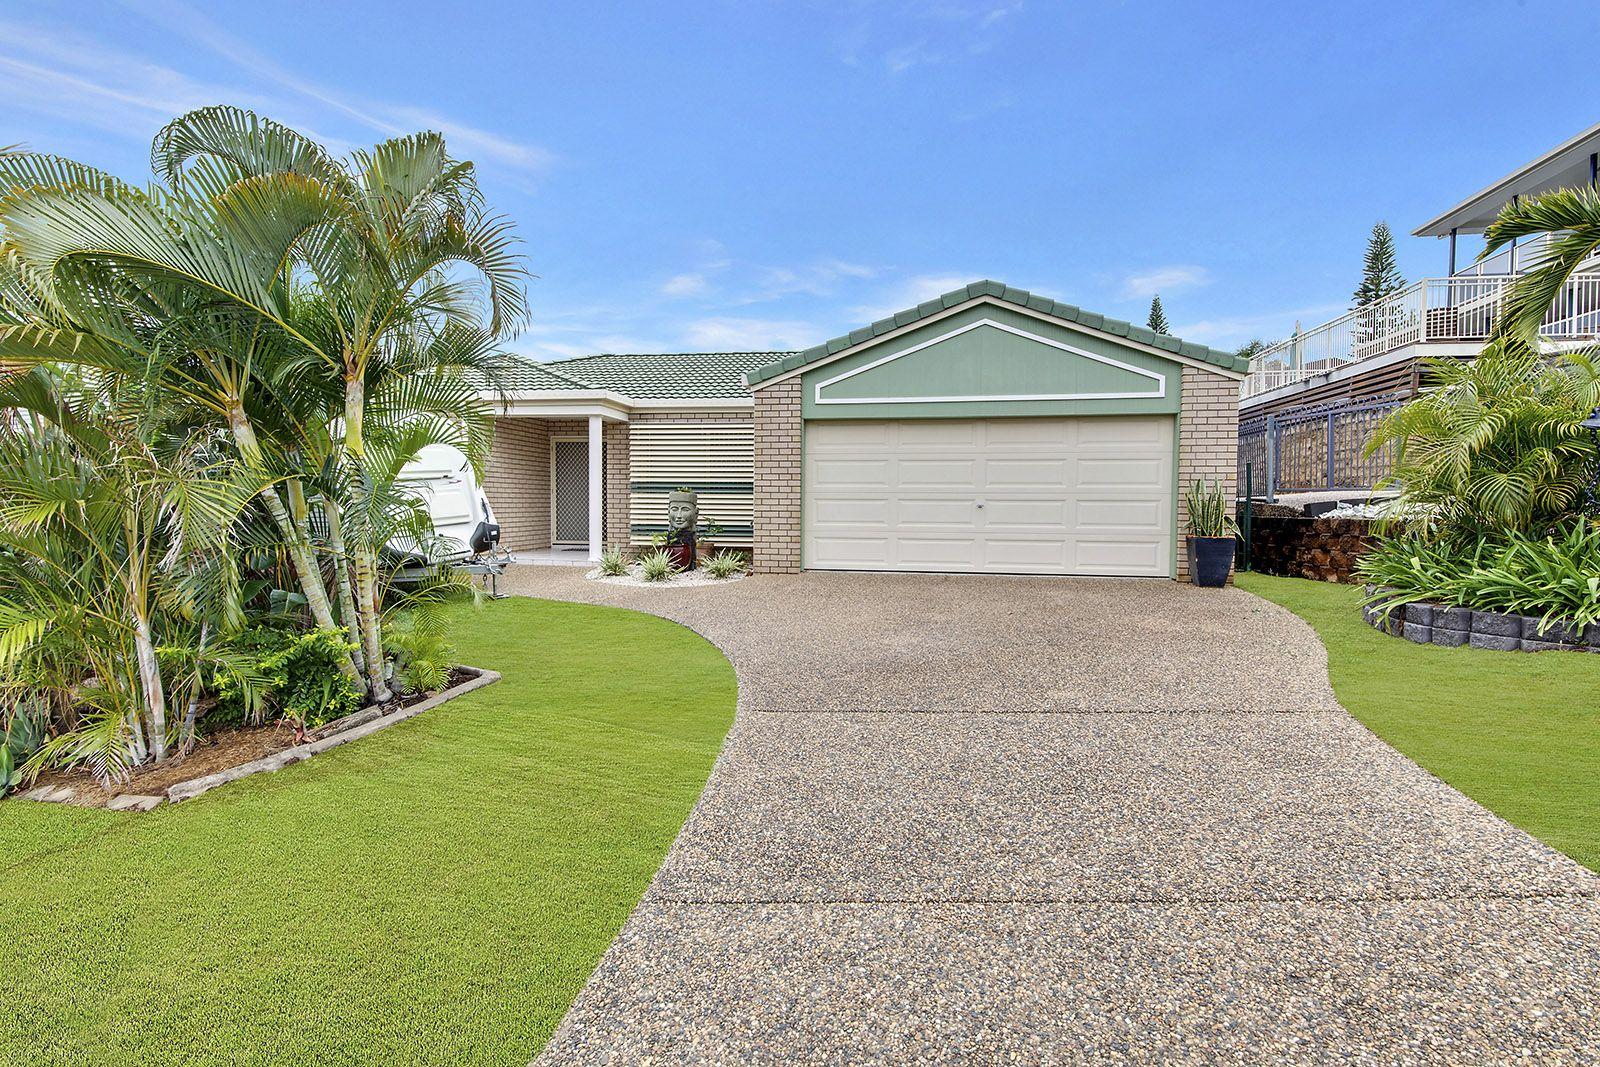 21 Callaghan Drive, Taranganba QLD 4703, Image 0